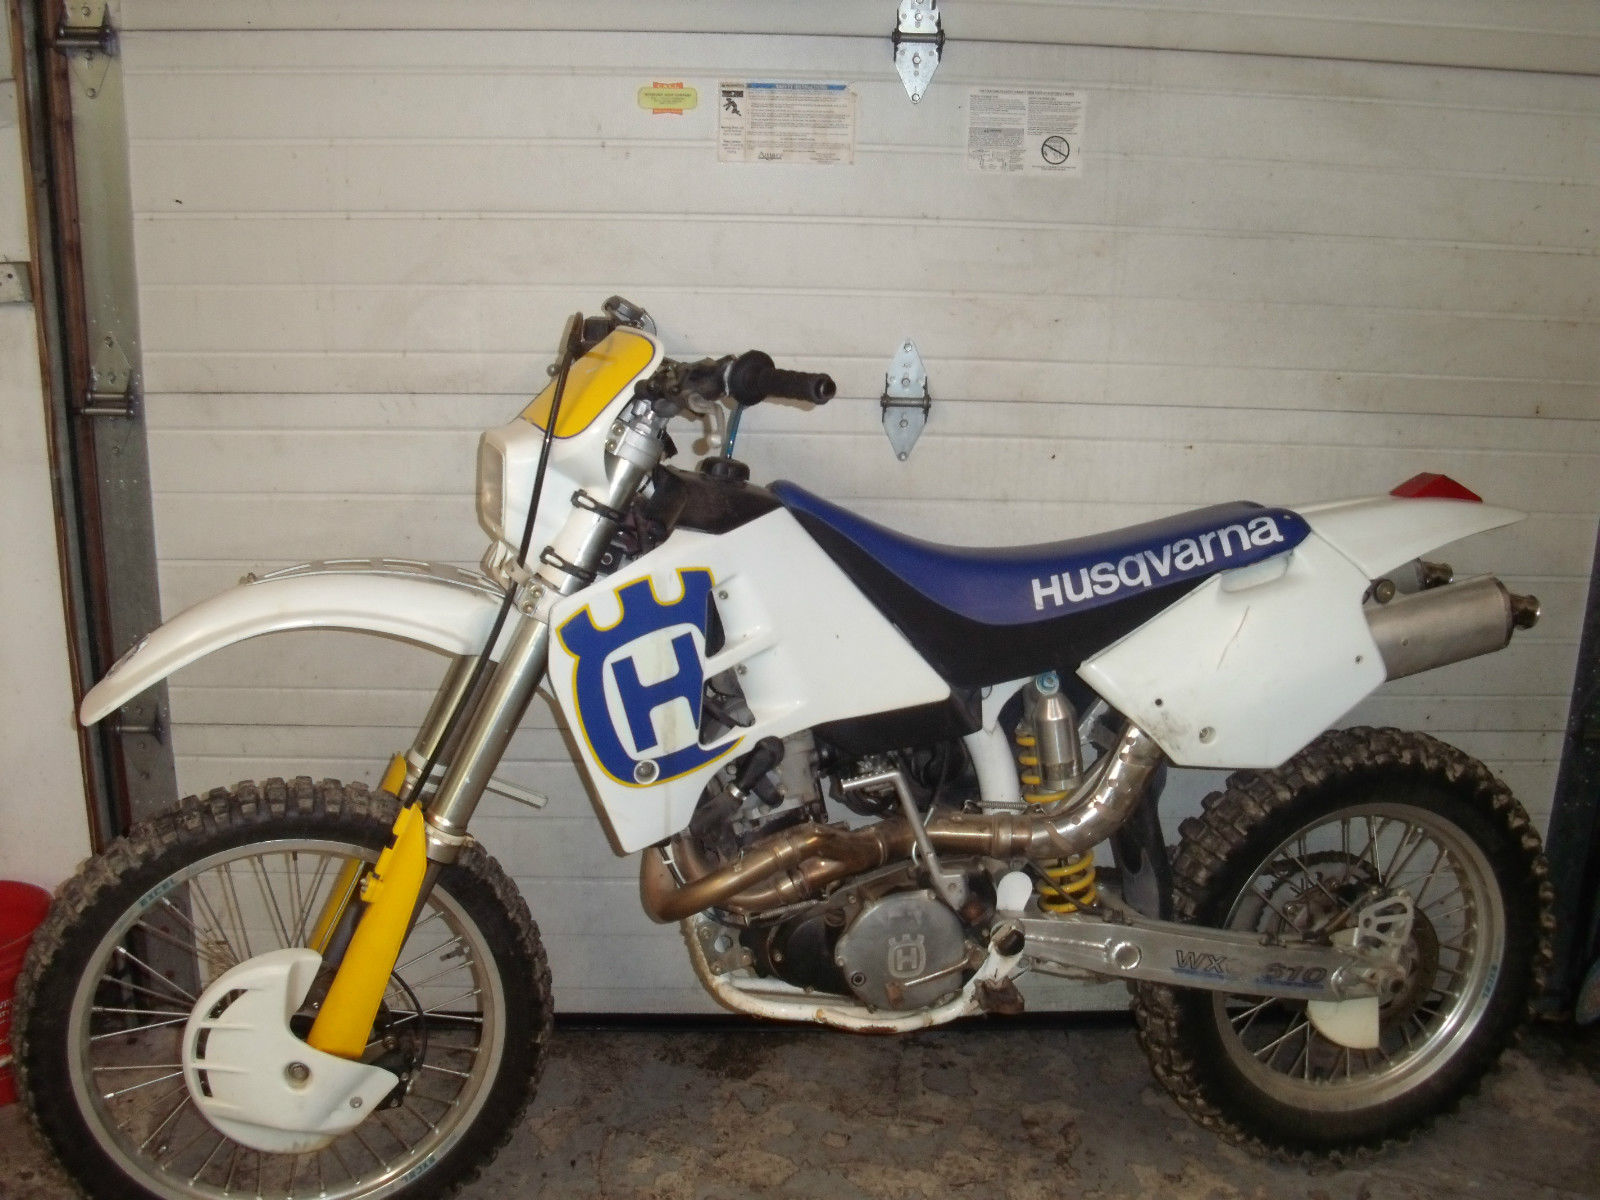 Husqvarna WXC-610 1993 in great running riding condition